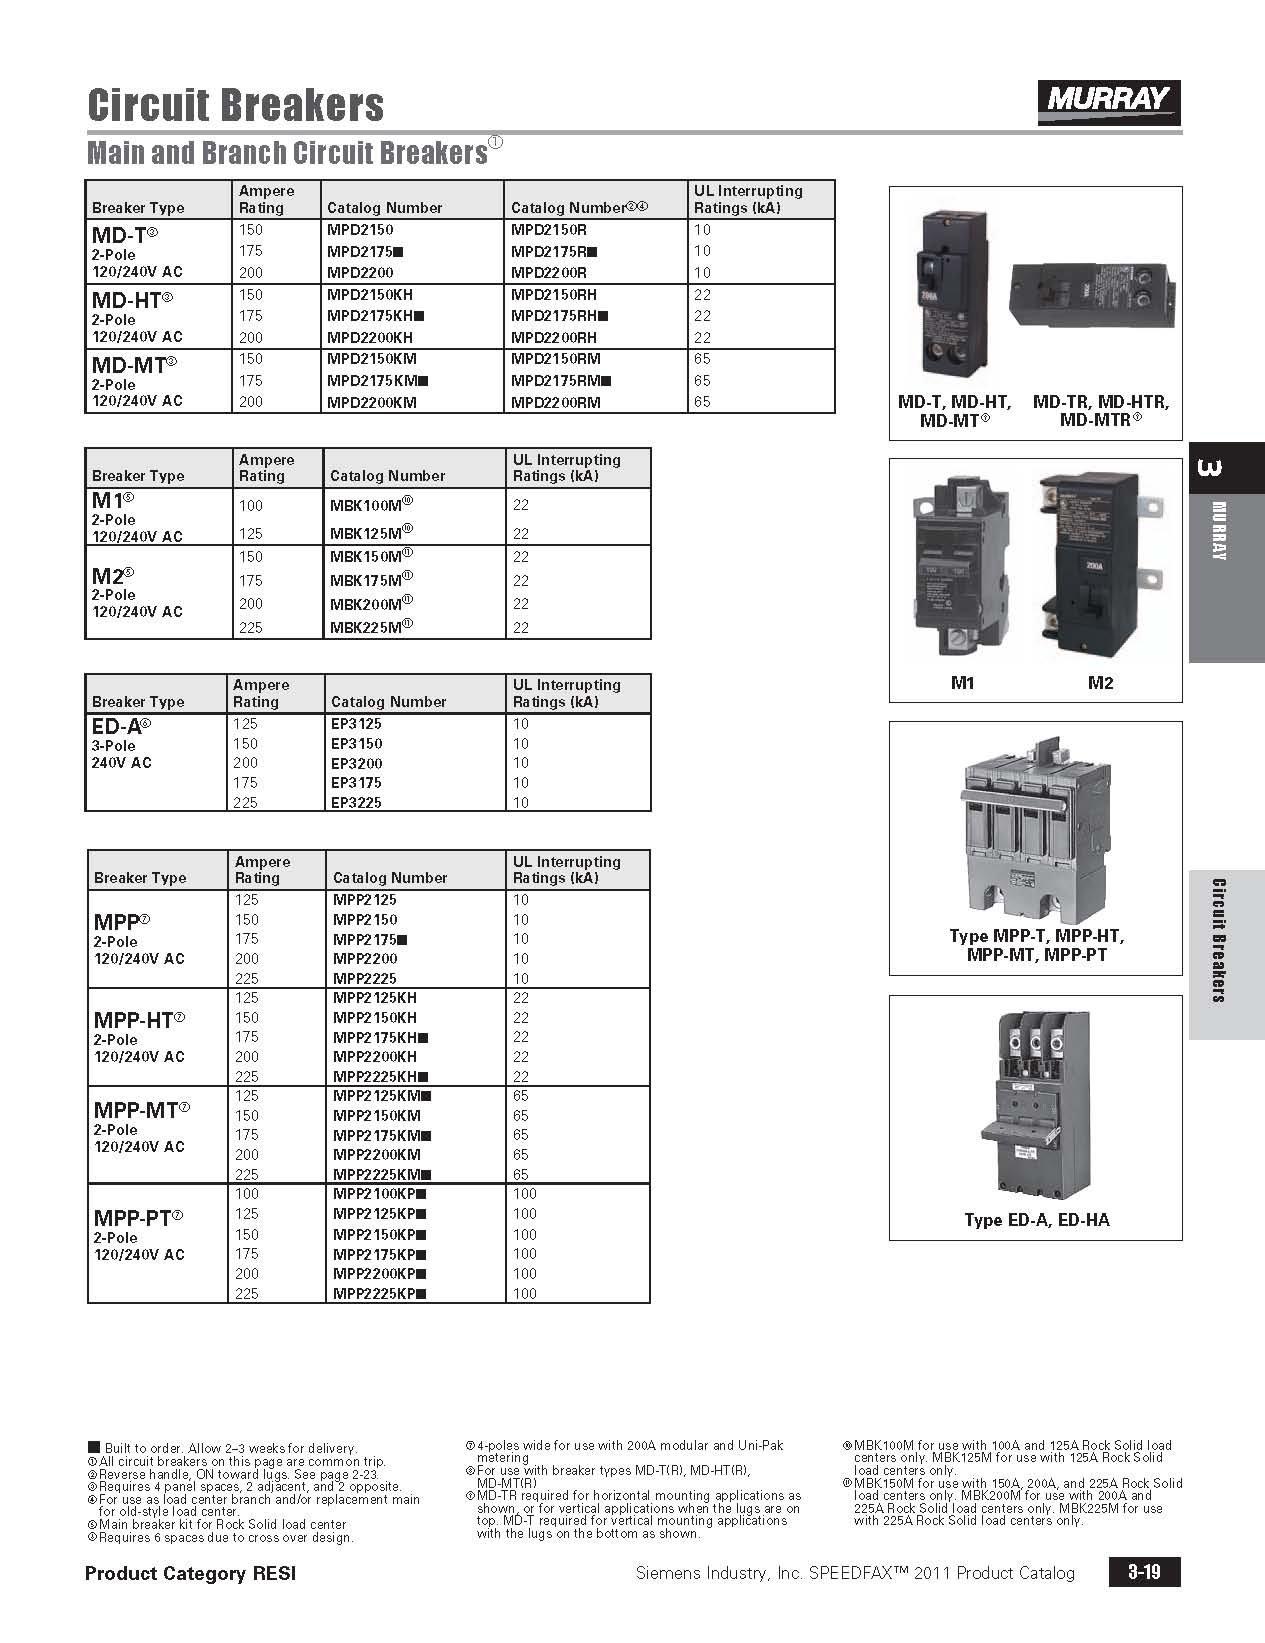 Murray Mpd2200rh 22 Kaic Rated 200 Amp Plug In Breaker 40892006513 Select Wiring Diagram